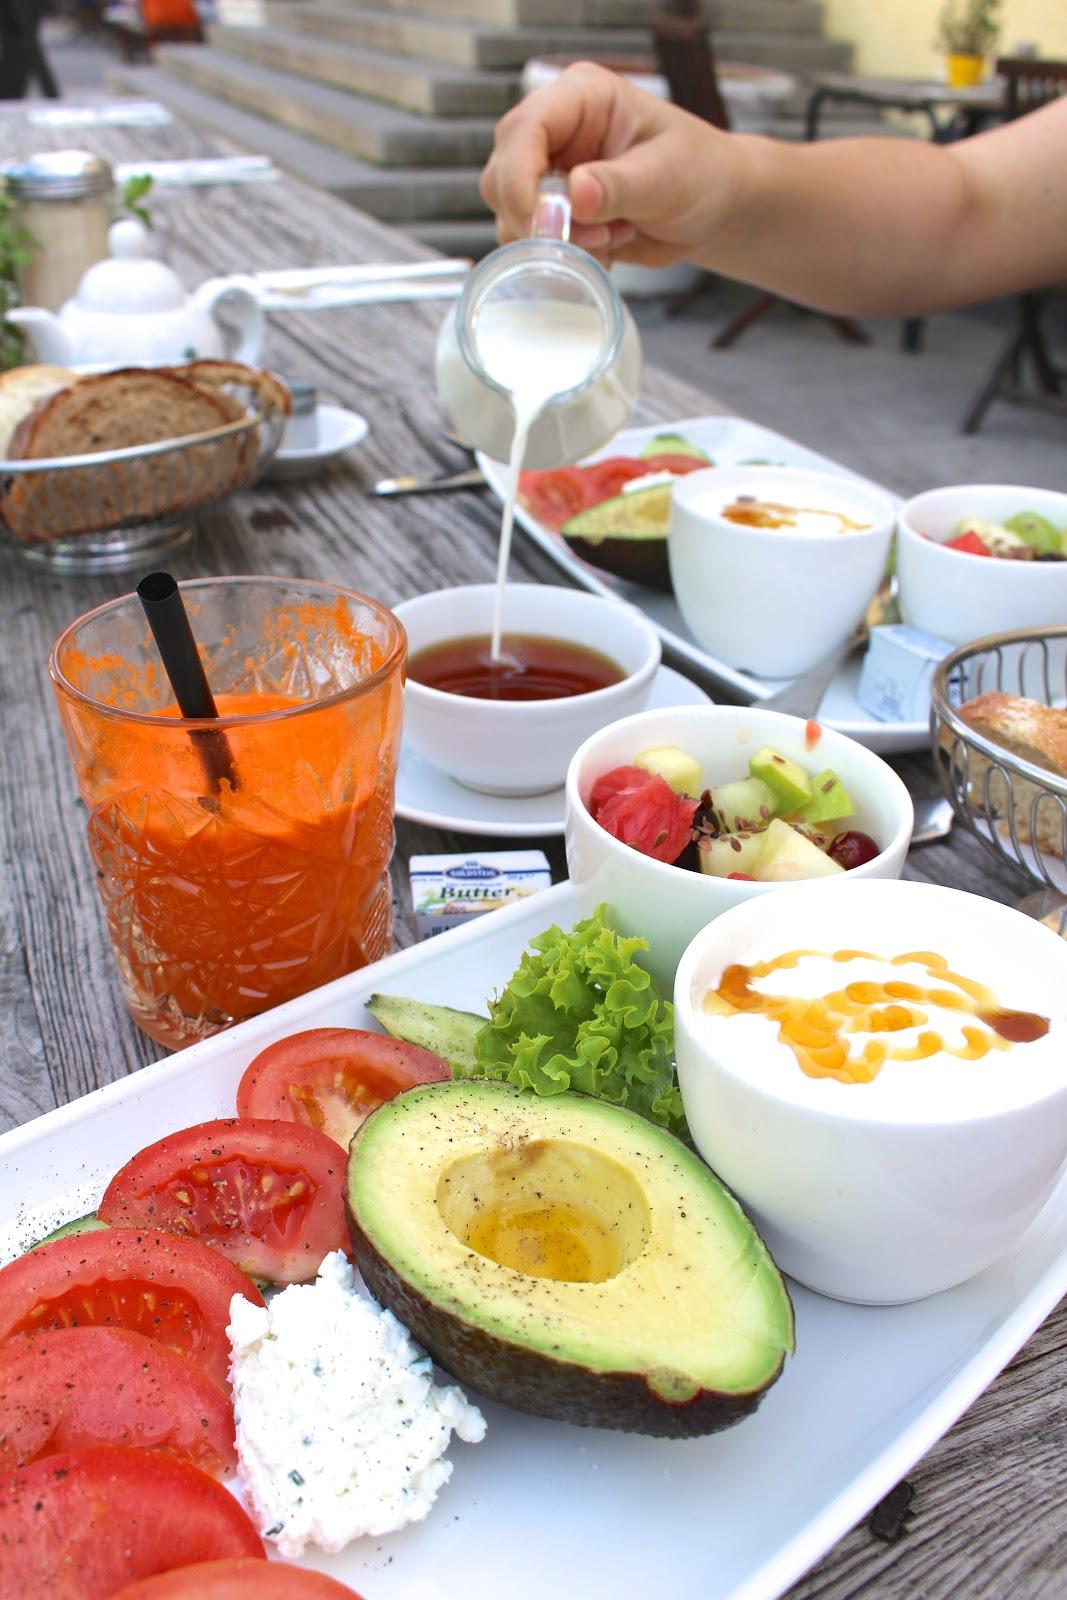 Gesundes frühstück Café Reitschule